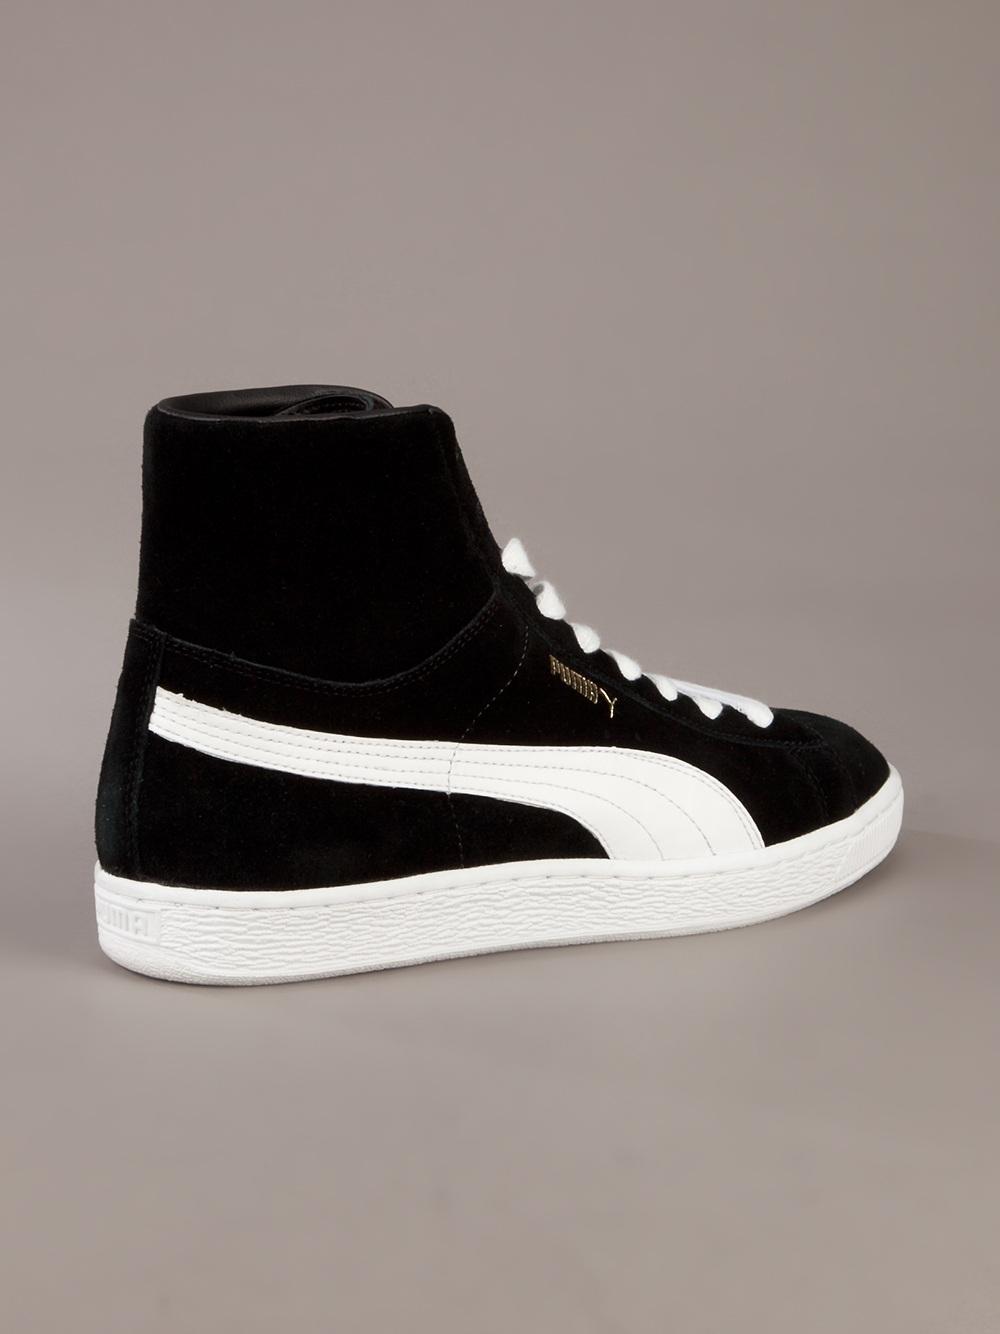 3a17318e793a99 puma high top sneakers womens puma outfits for kids balotelli puma shoes